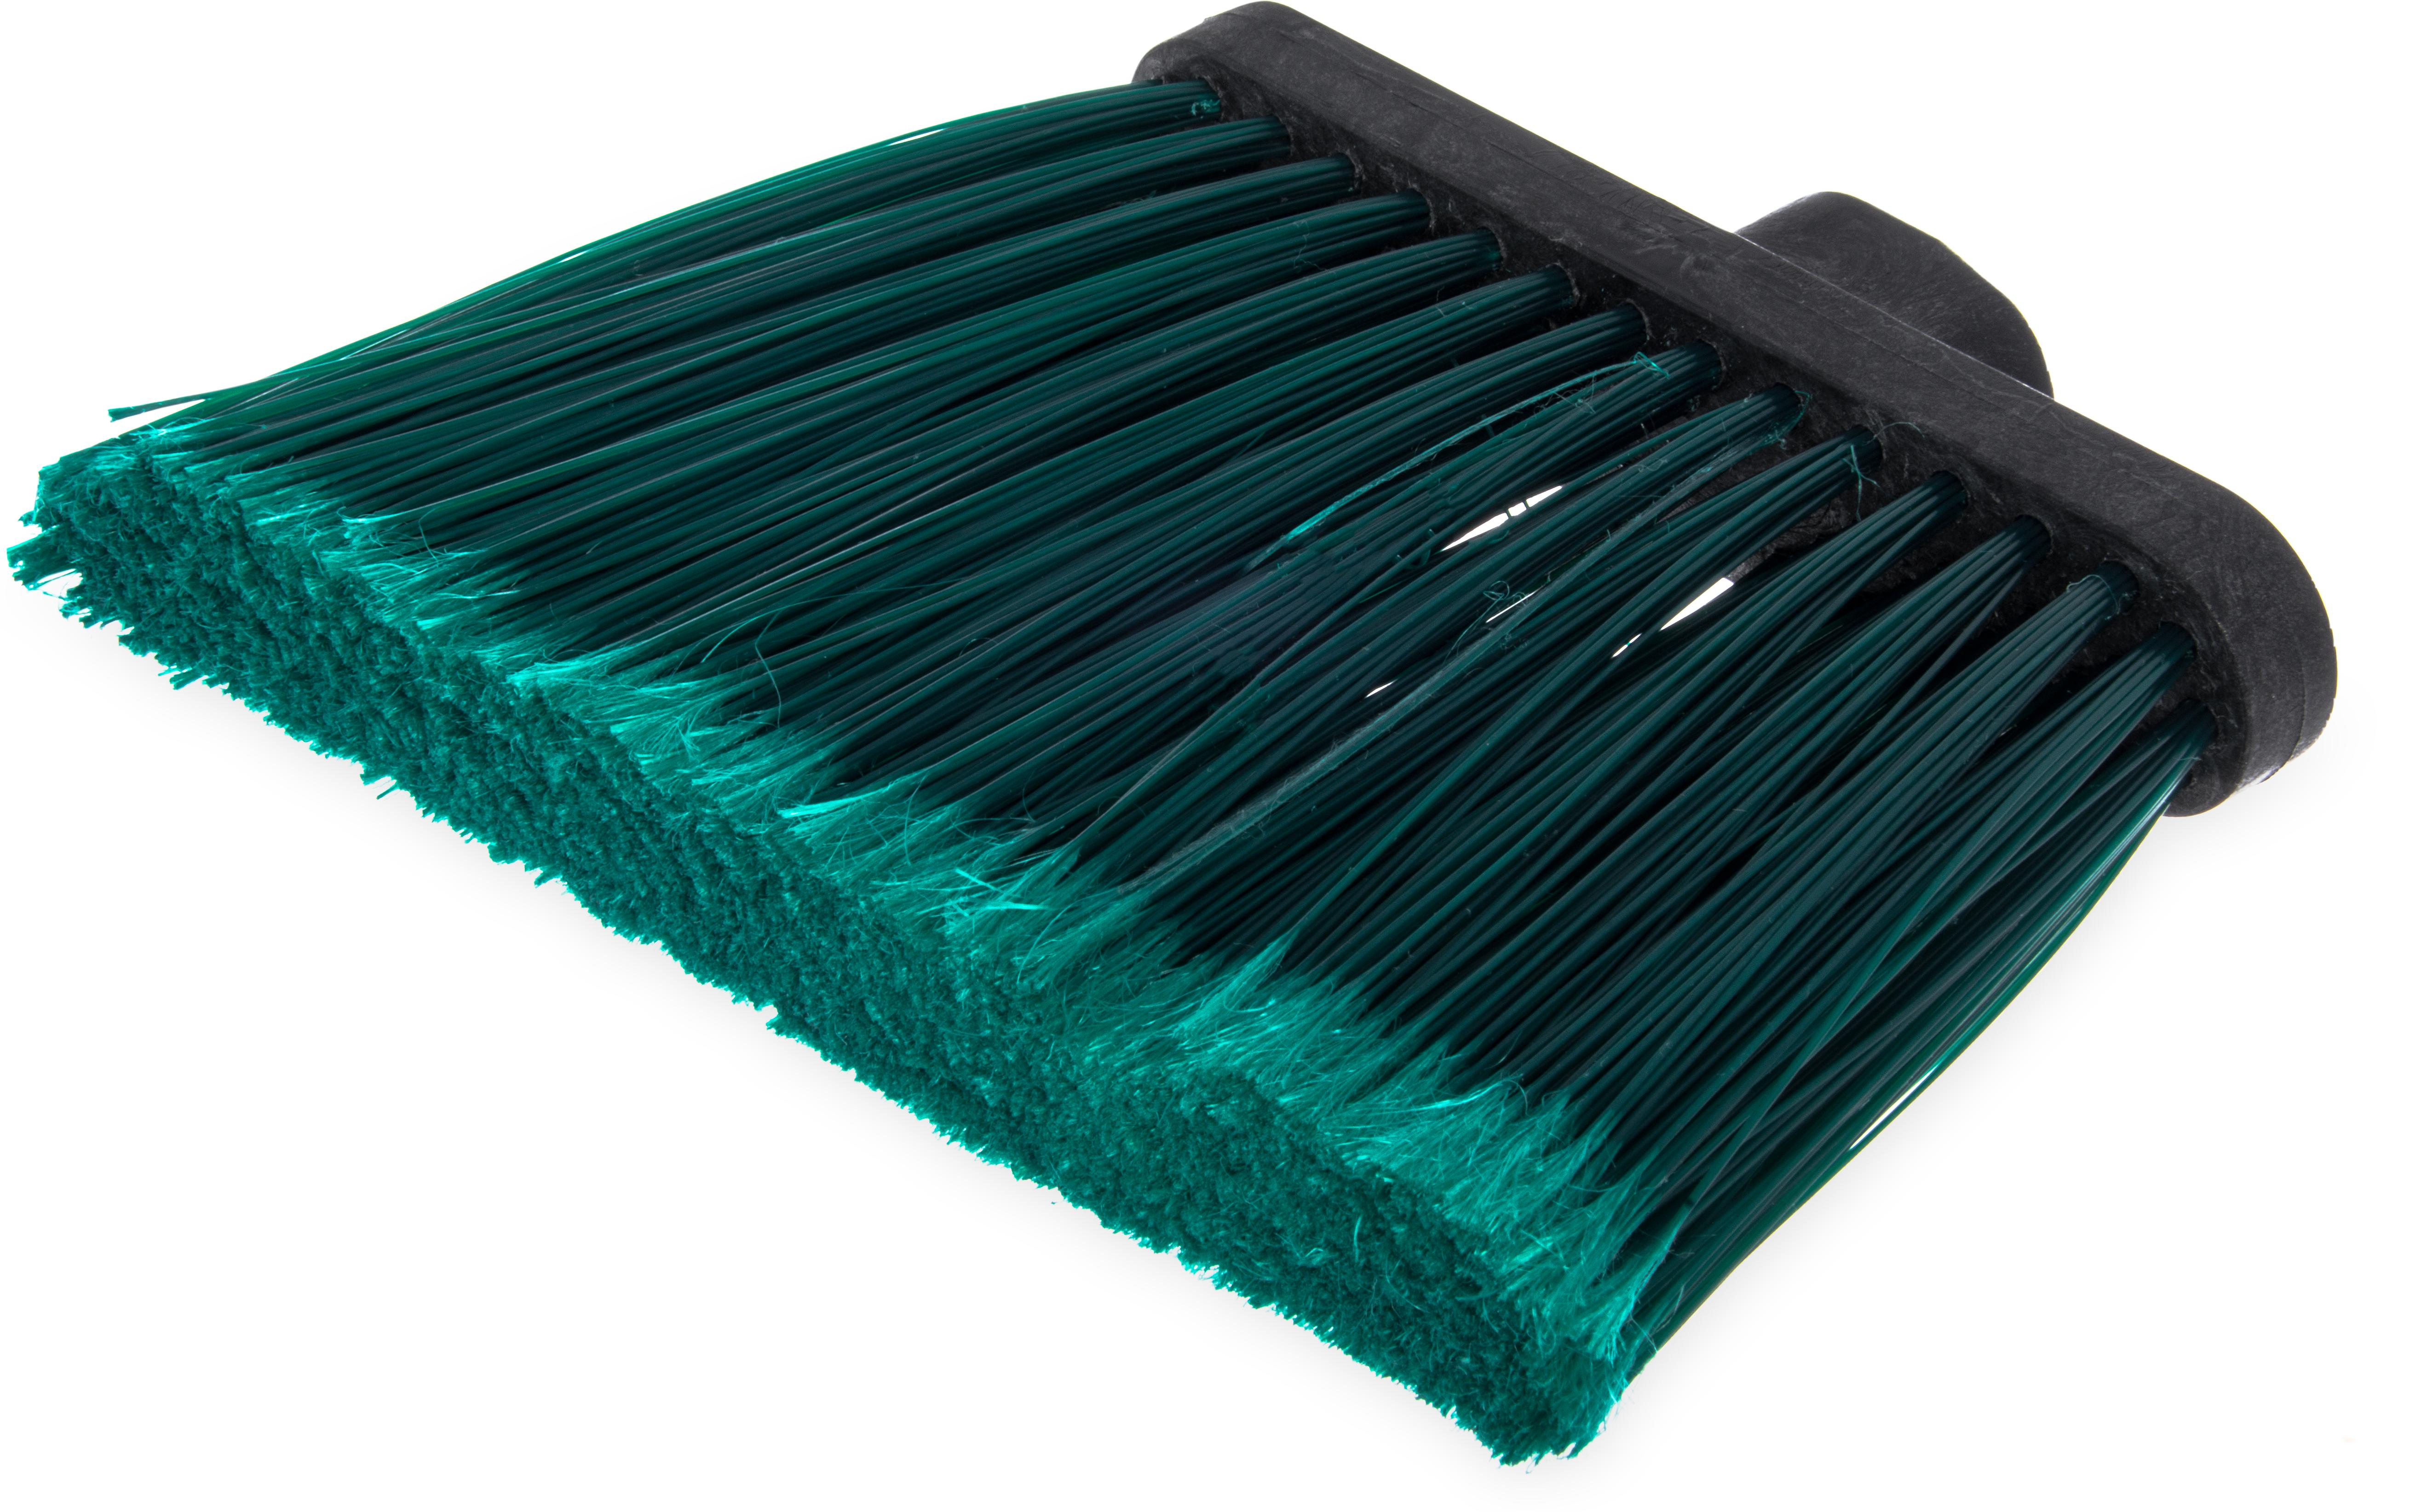 Carlisle 3686709 duo-sweep angle brooms